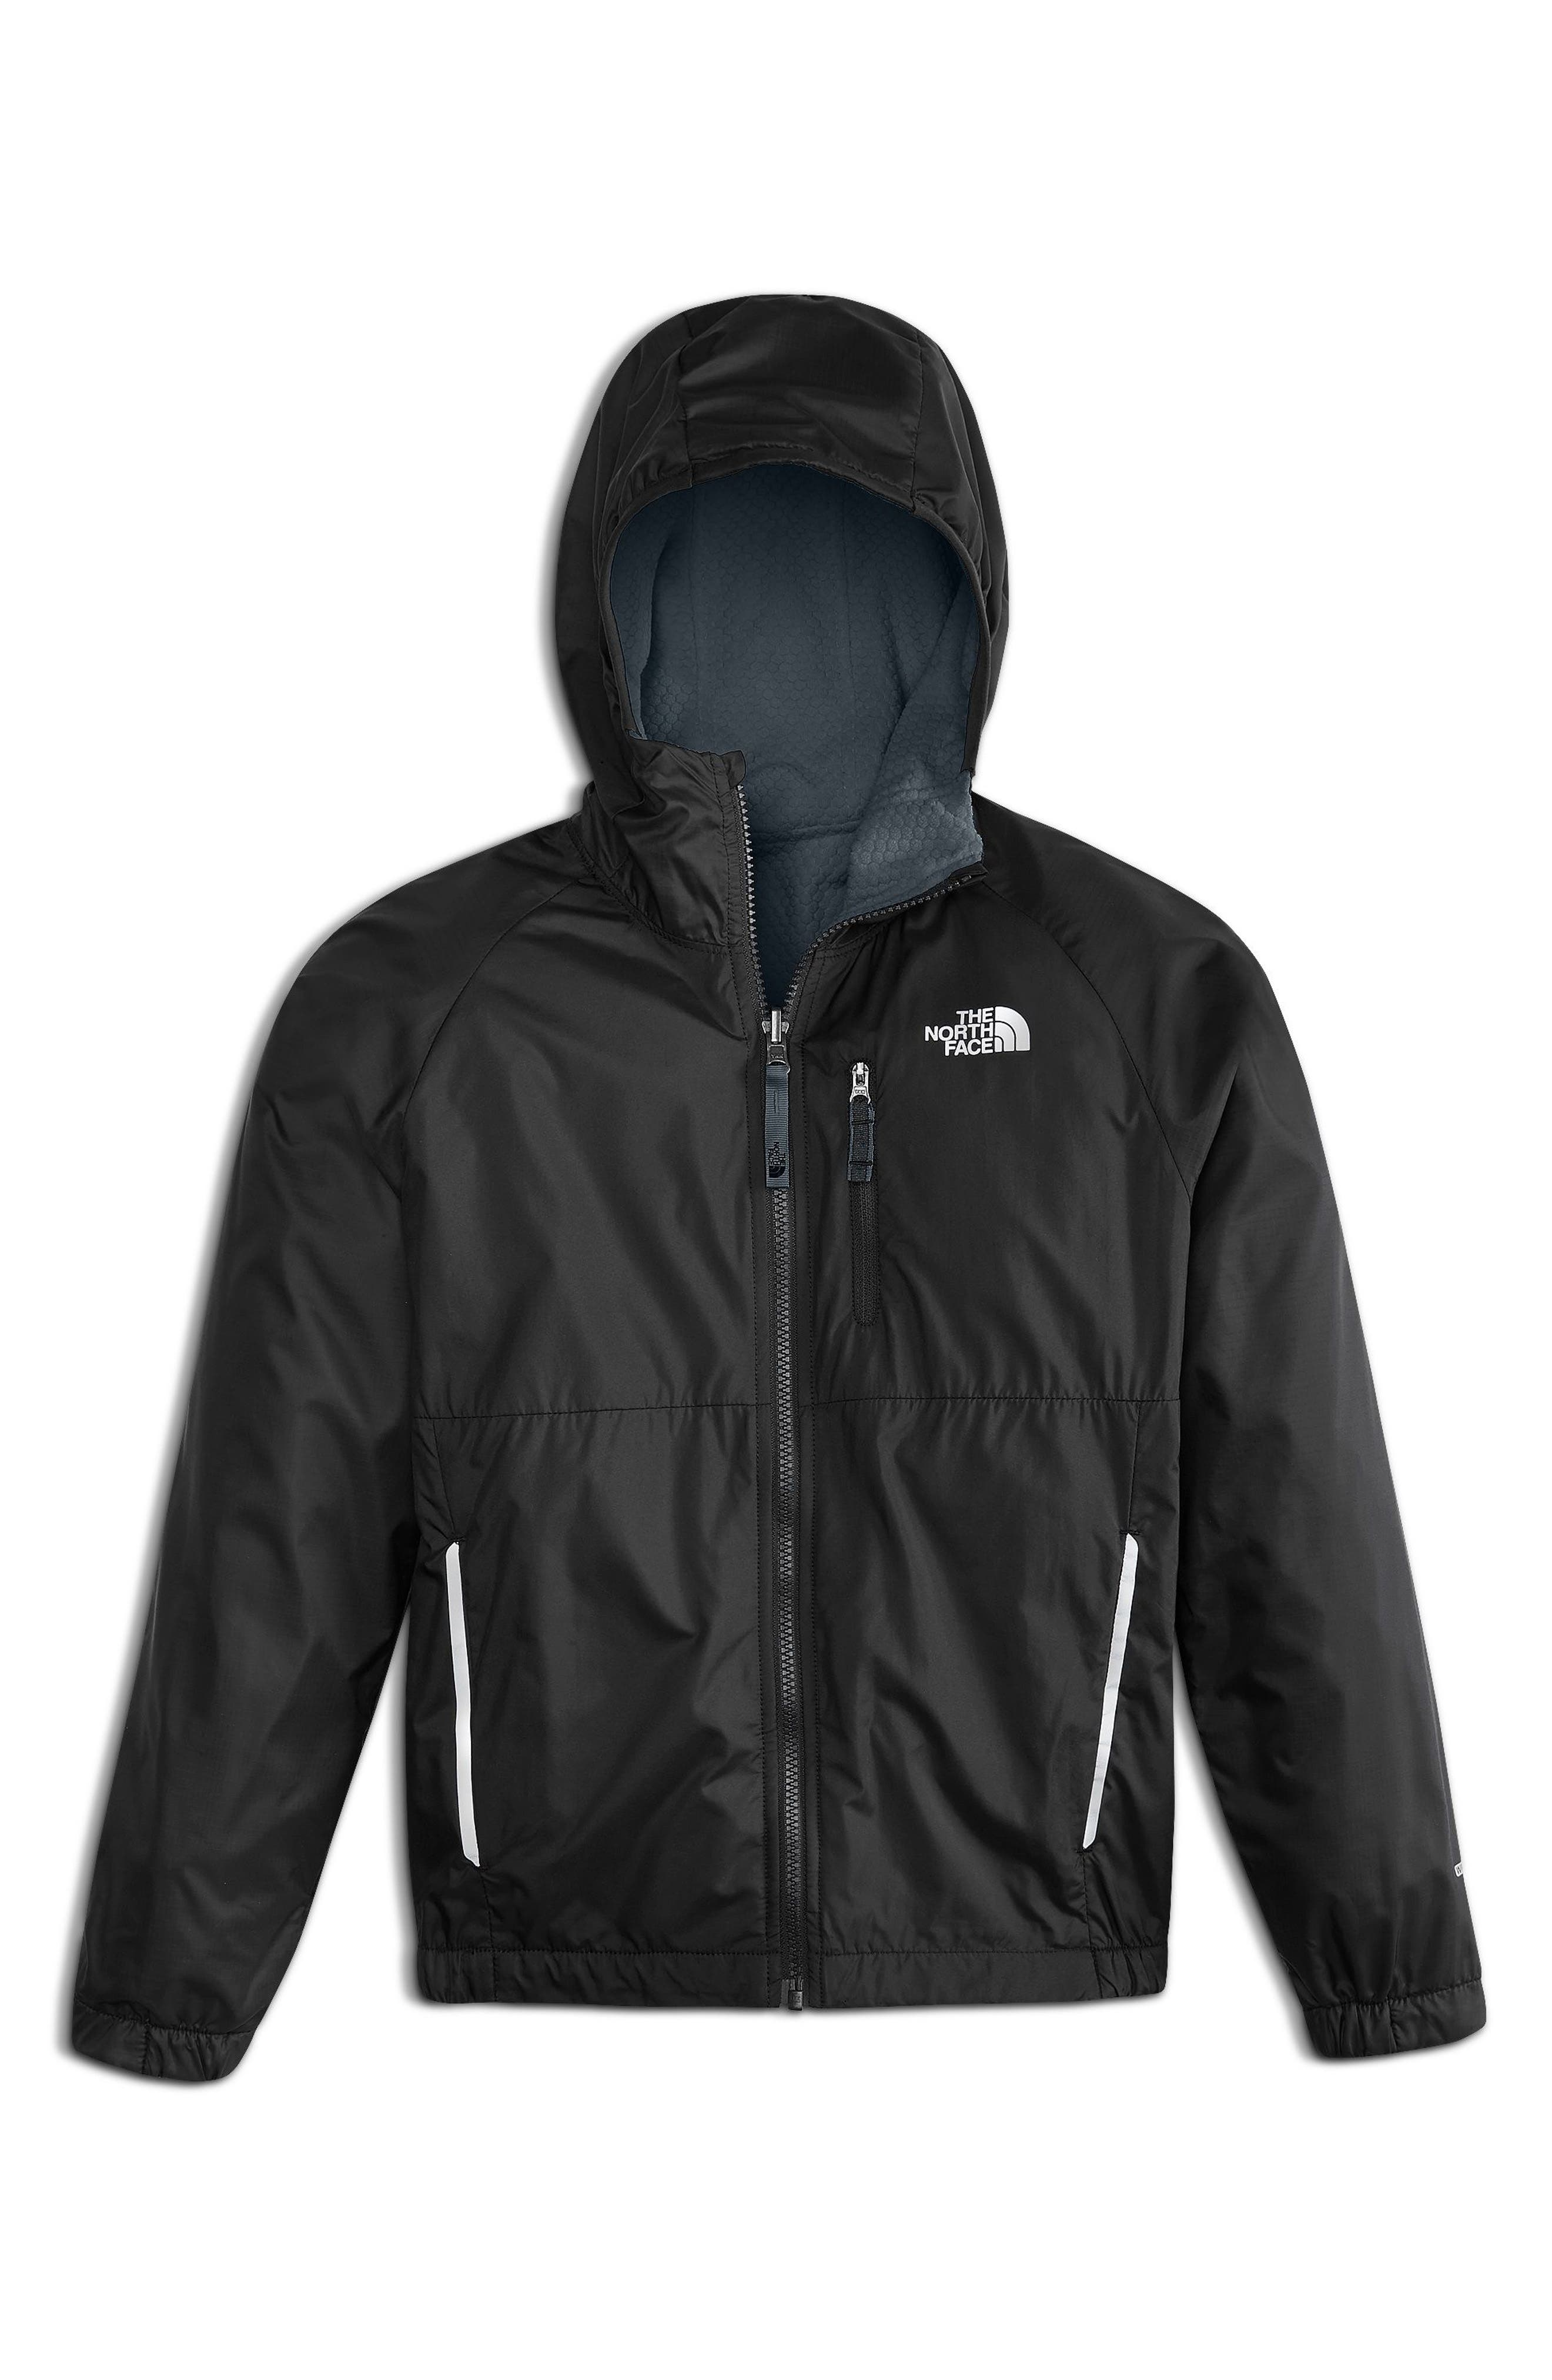 Breezeway Reversible Wind Jacket,                             Main thumbnail 1, color,                             Tnf Black